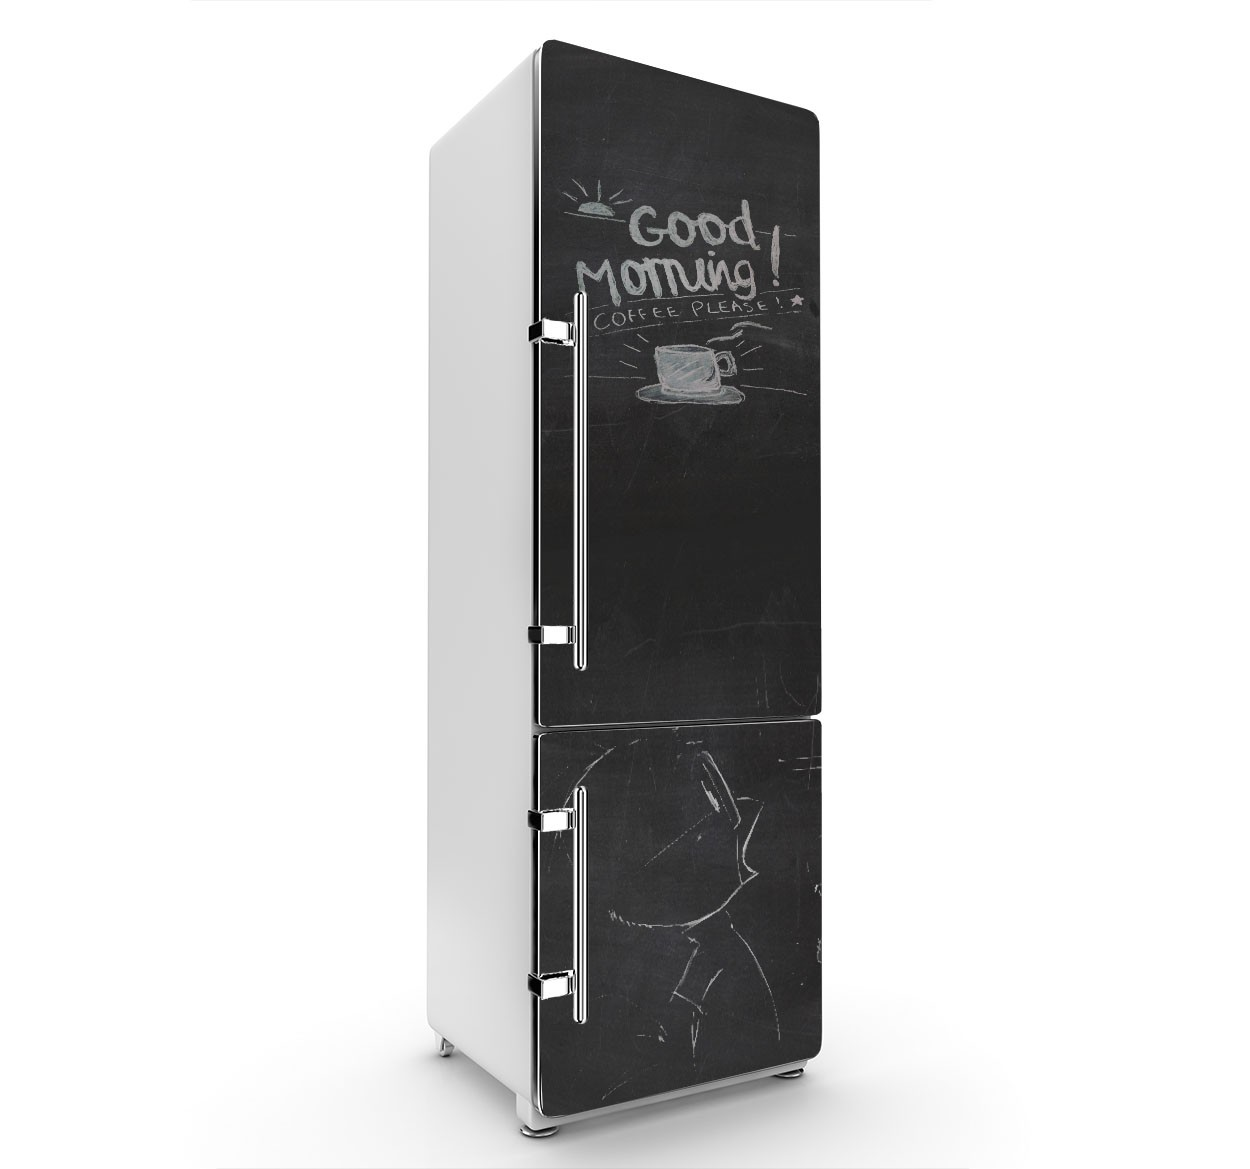 customiser son frigo avec un sticker ardoise femin 39 elles. Black Bedroom Furniture Sets. Home Design Ideas